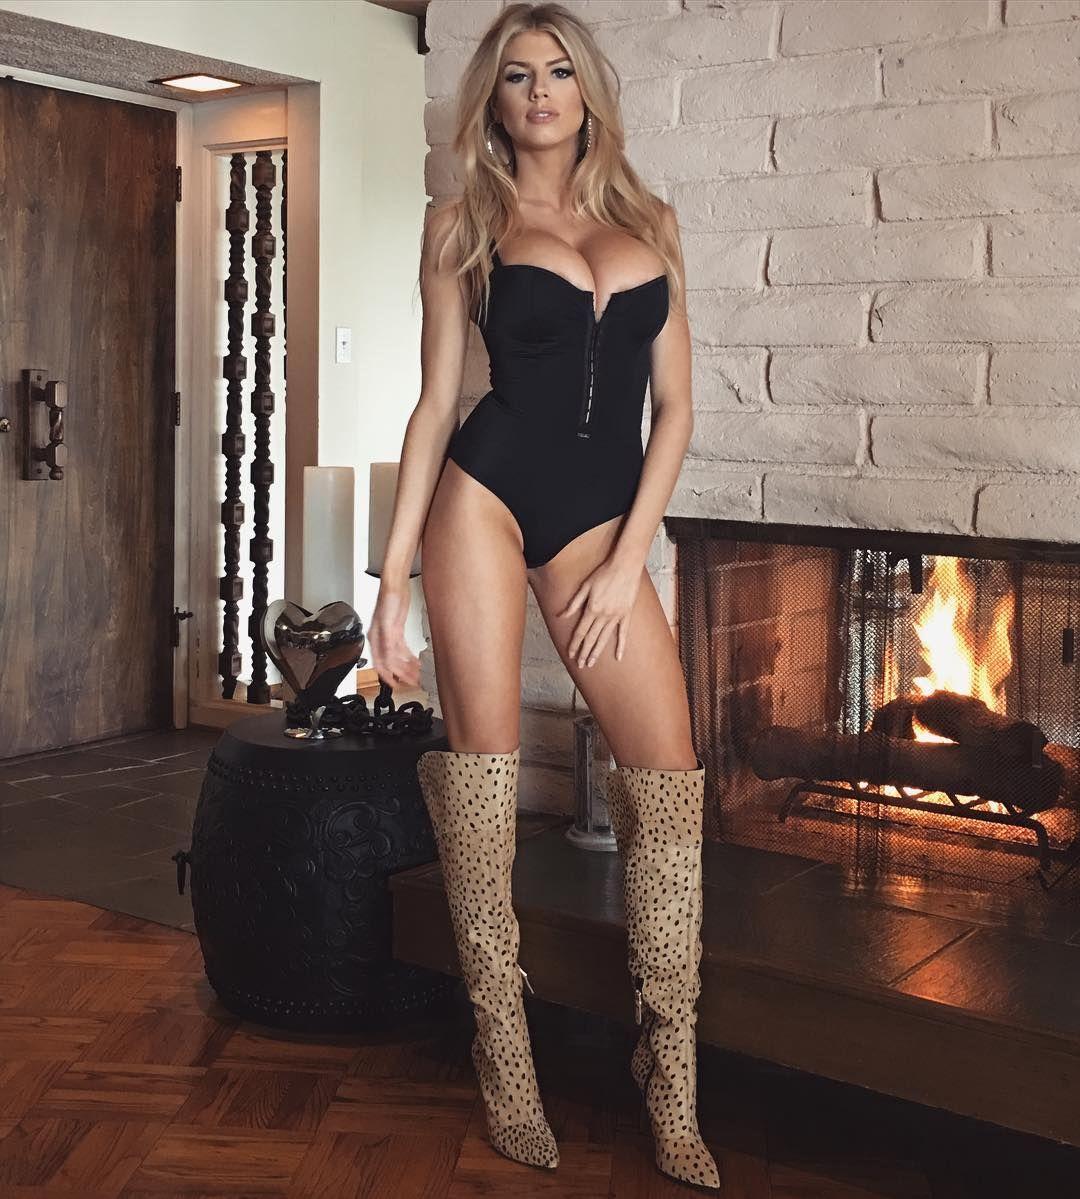 Charlotte-McKinney-Sexy-4-1 (1)